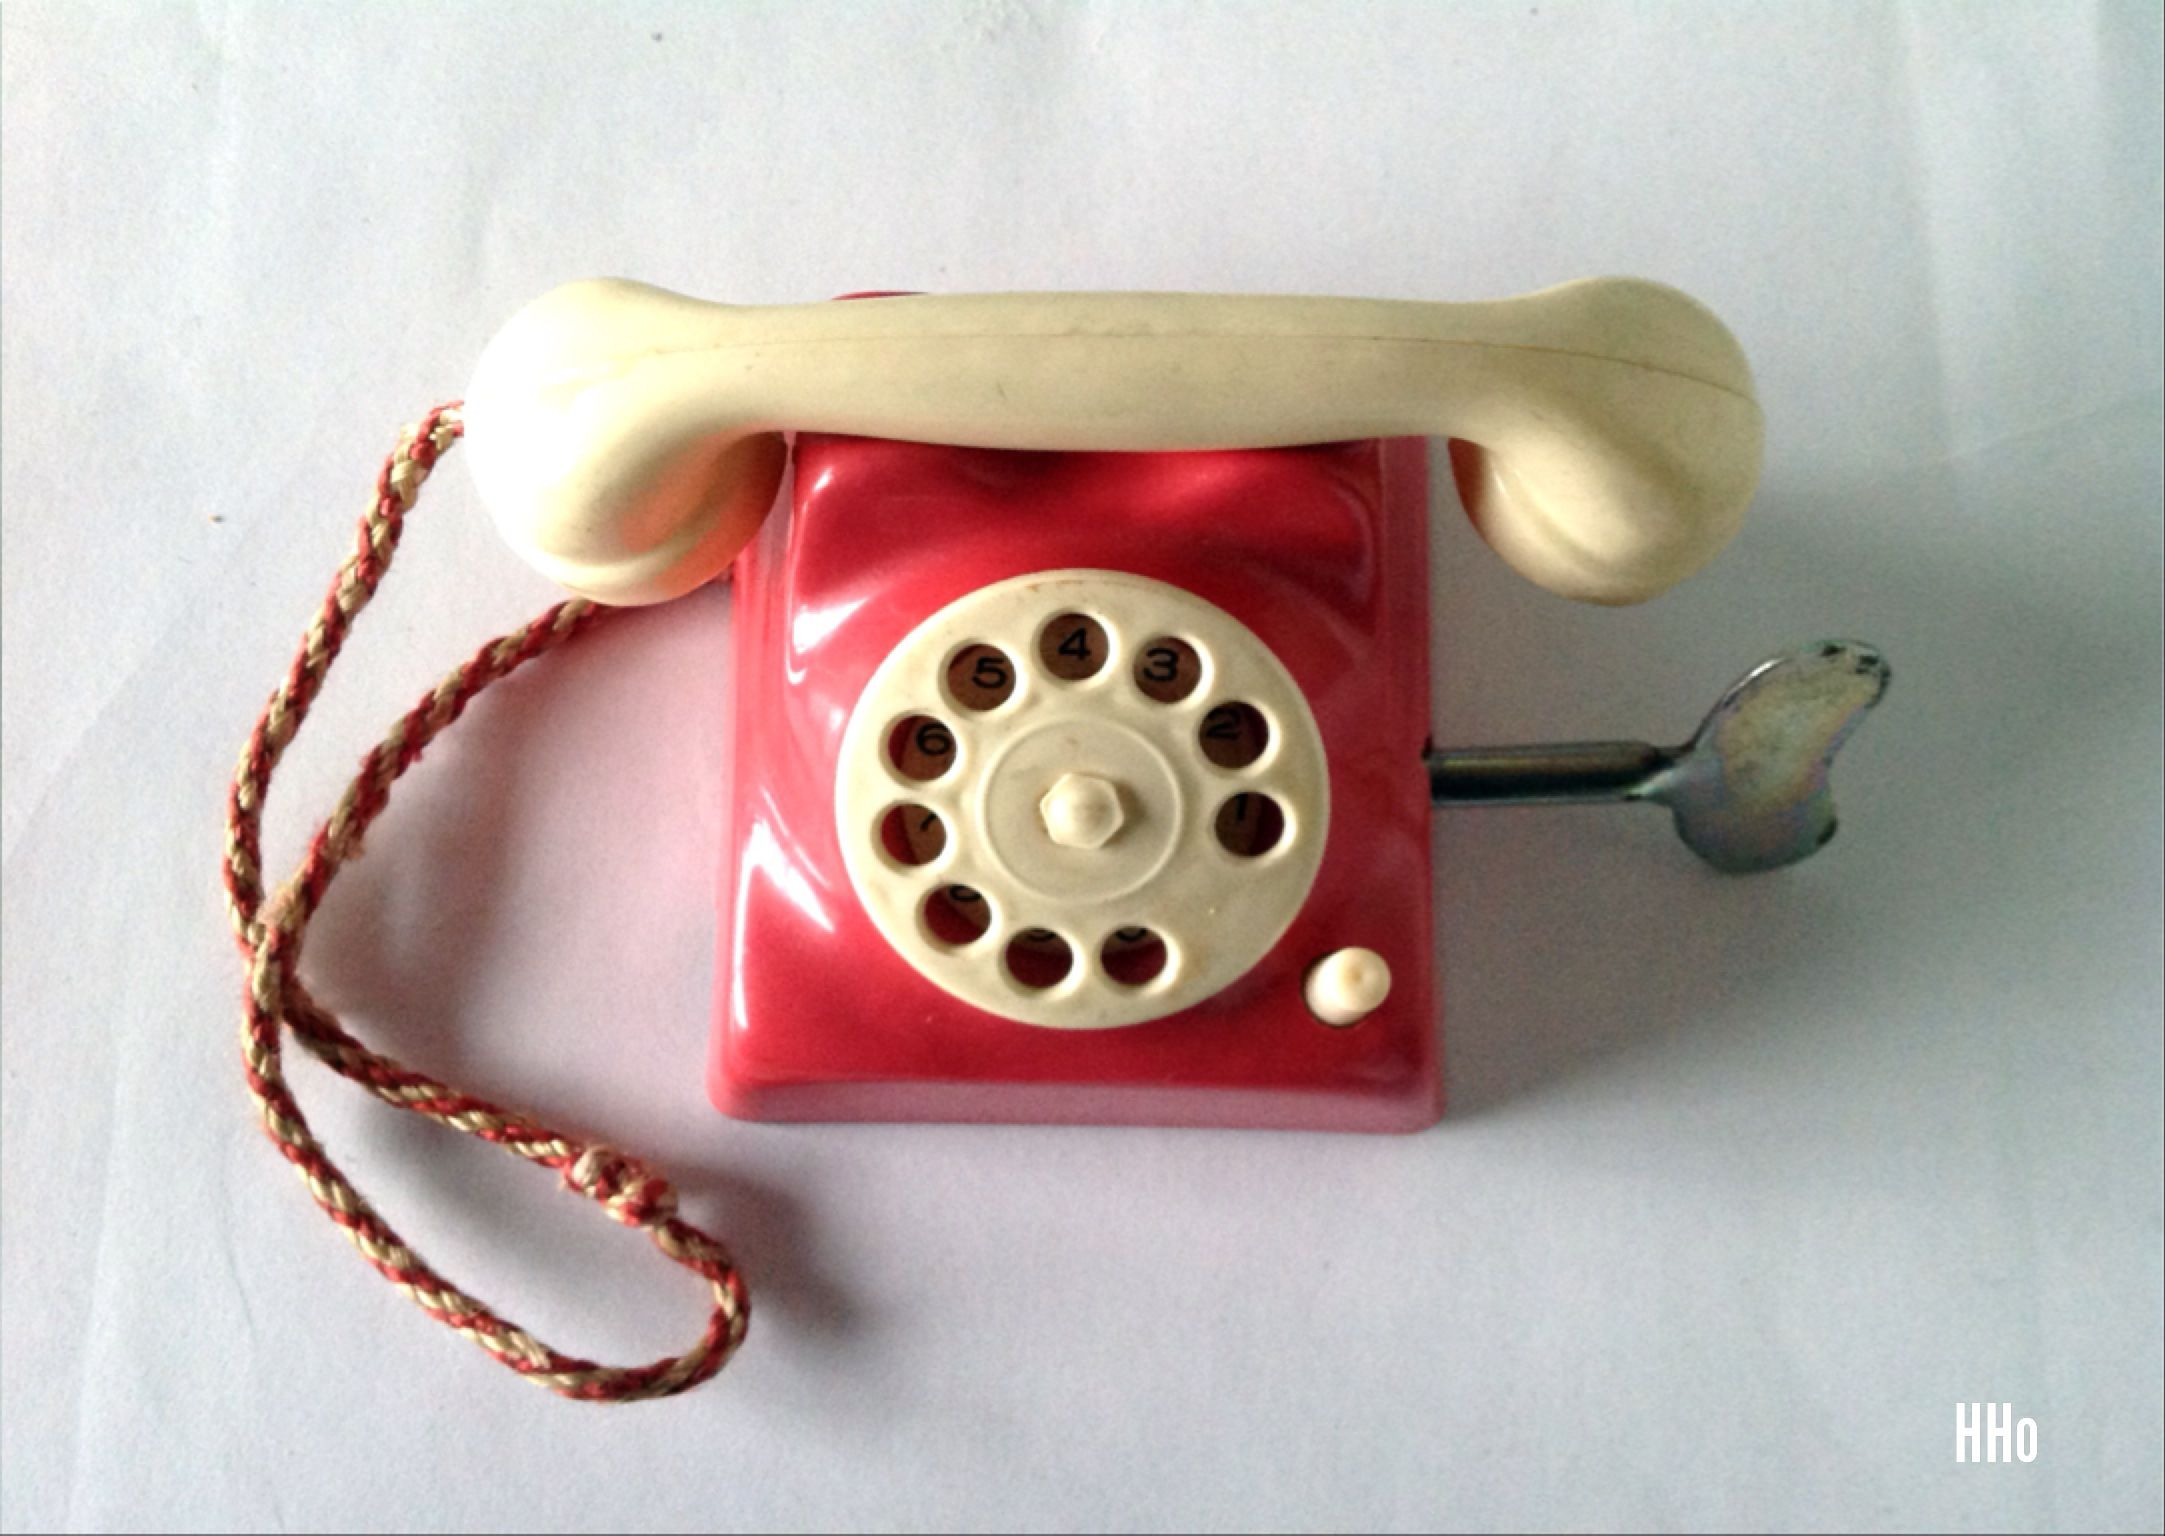 Speeltelefoon.HanHoekstra